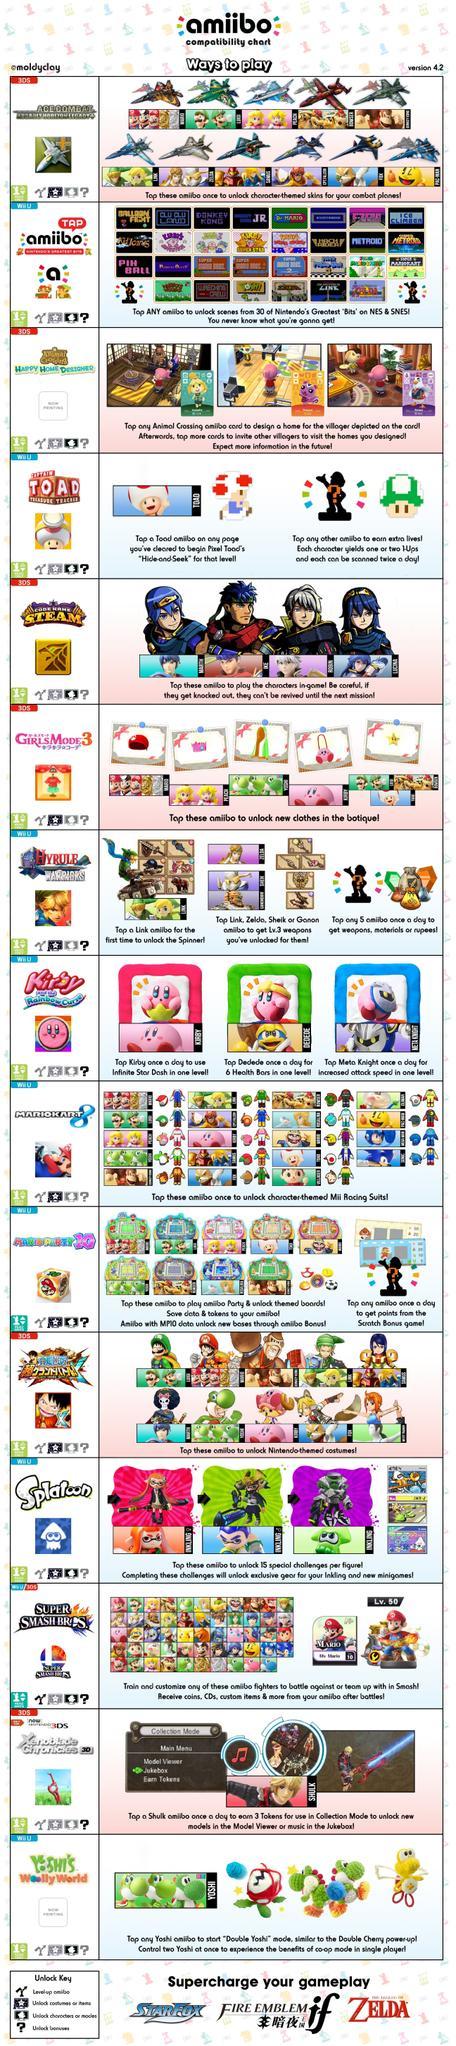 "Nintendo fan ""moldyclay"" latest amiibo compatibility chart has a ..."